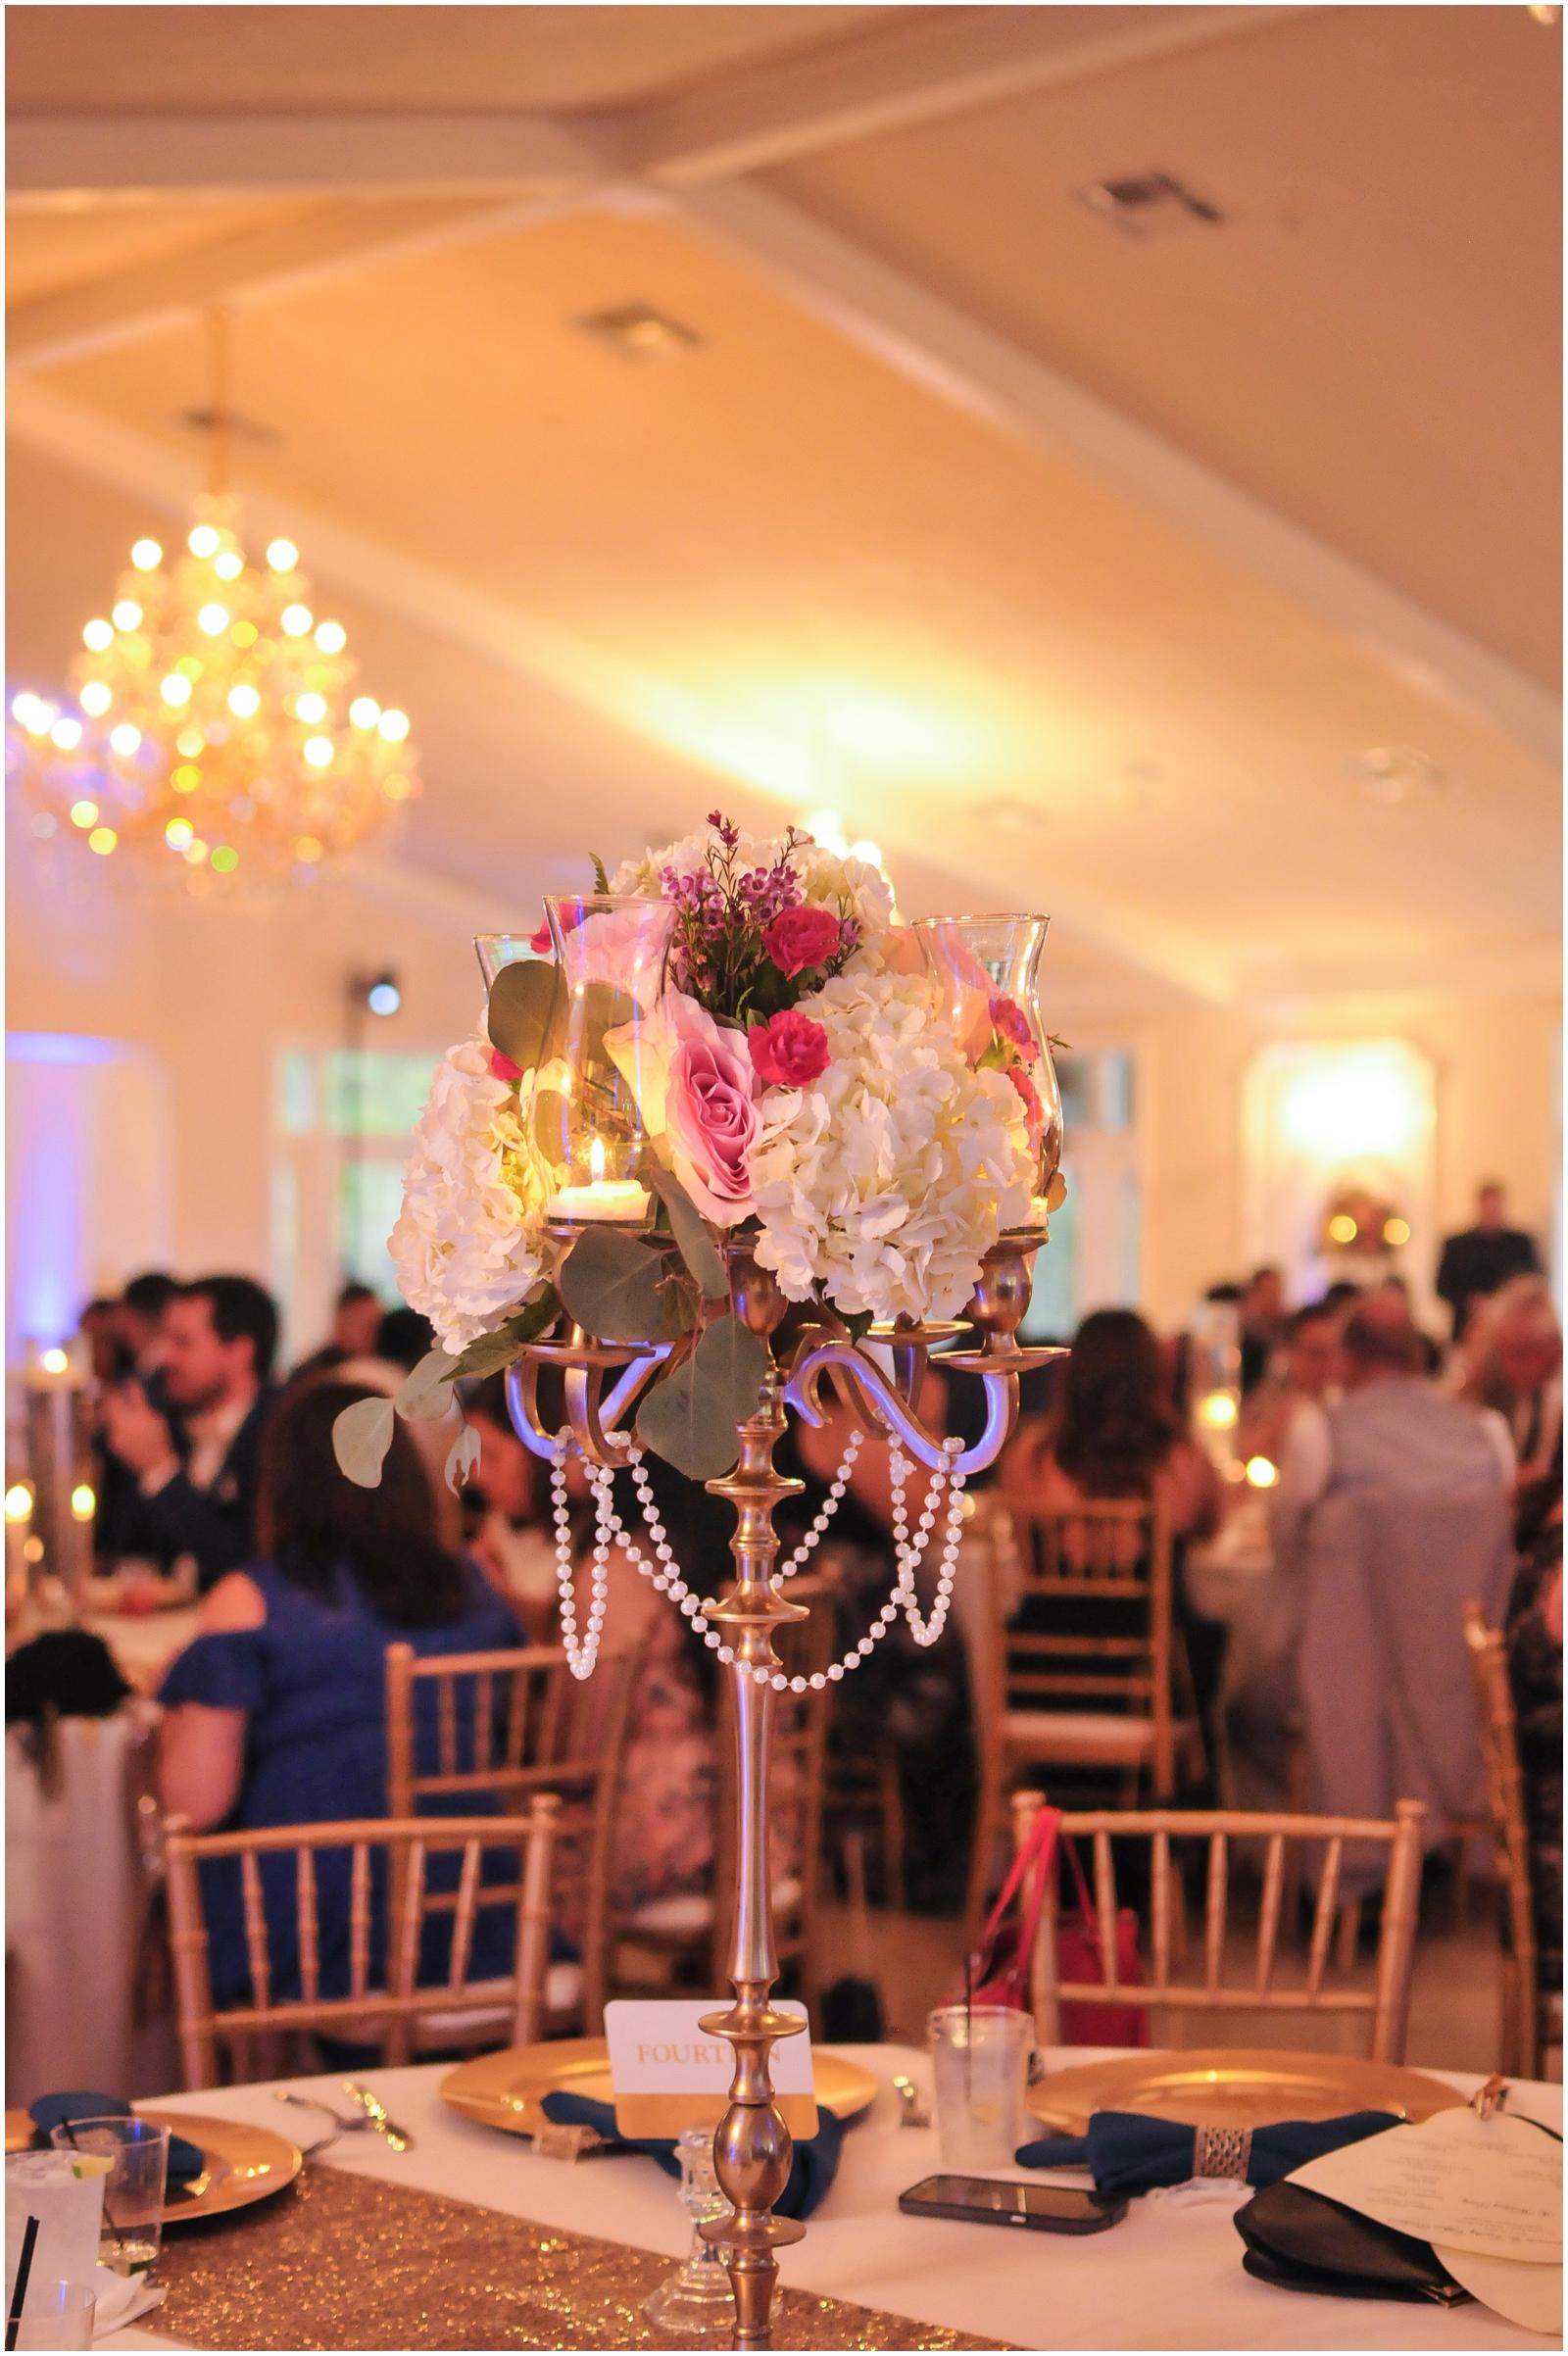 Rustic-Elegant-Wedding-Venue-in-Tampa-Stonebridge-Events_0450.jpg